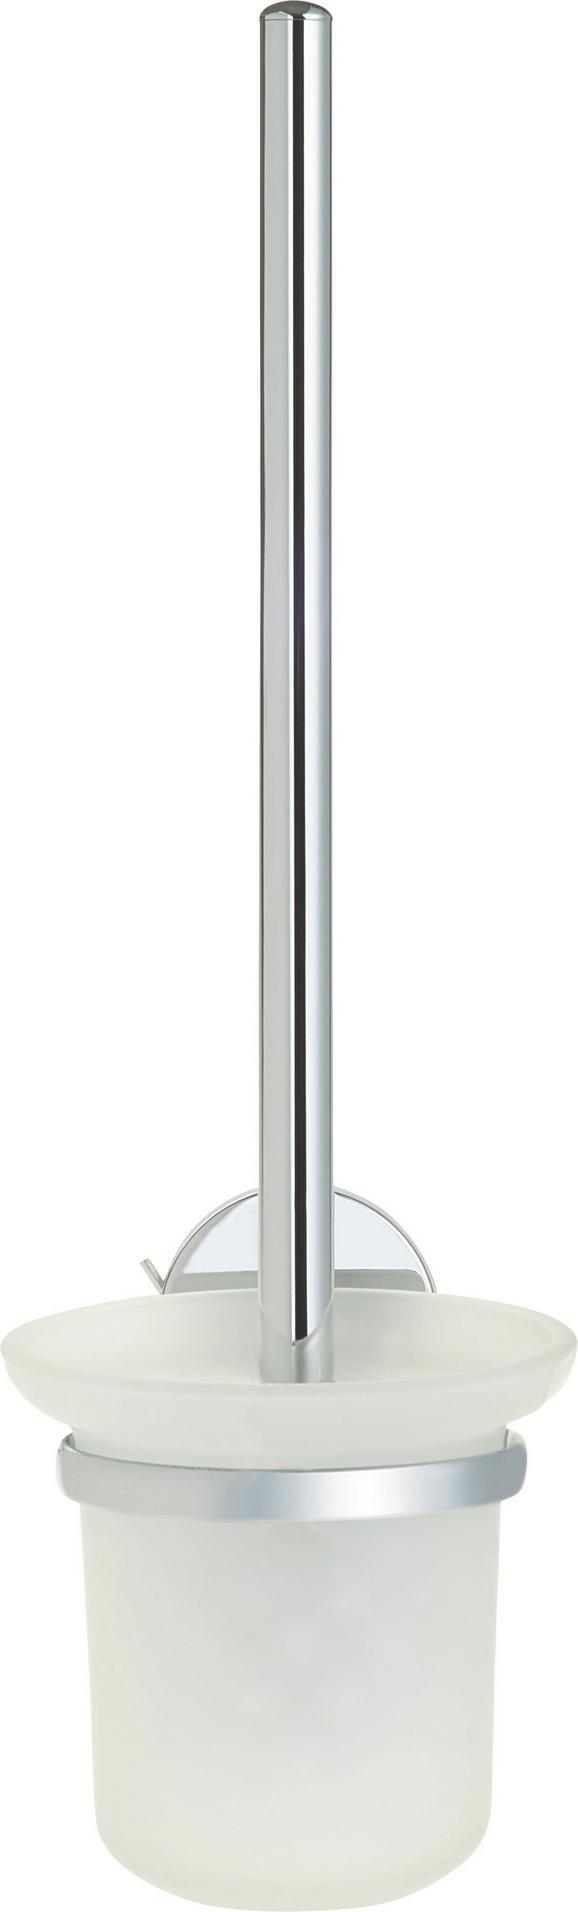 Wc-kefe Tartóval Vision 86766   -sb- - krómszínű, műanyag/üveg (11/38/15cm)